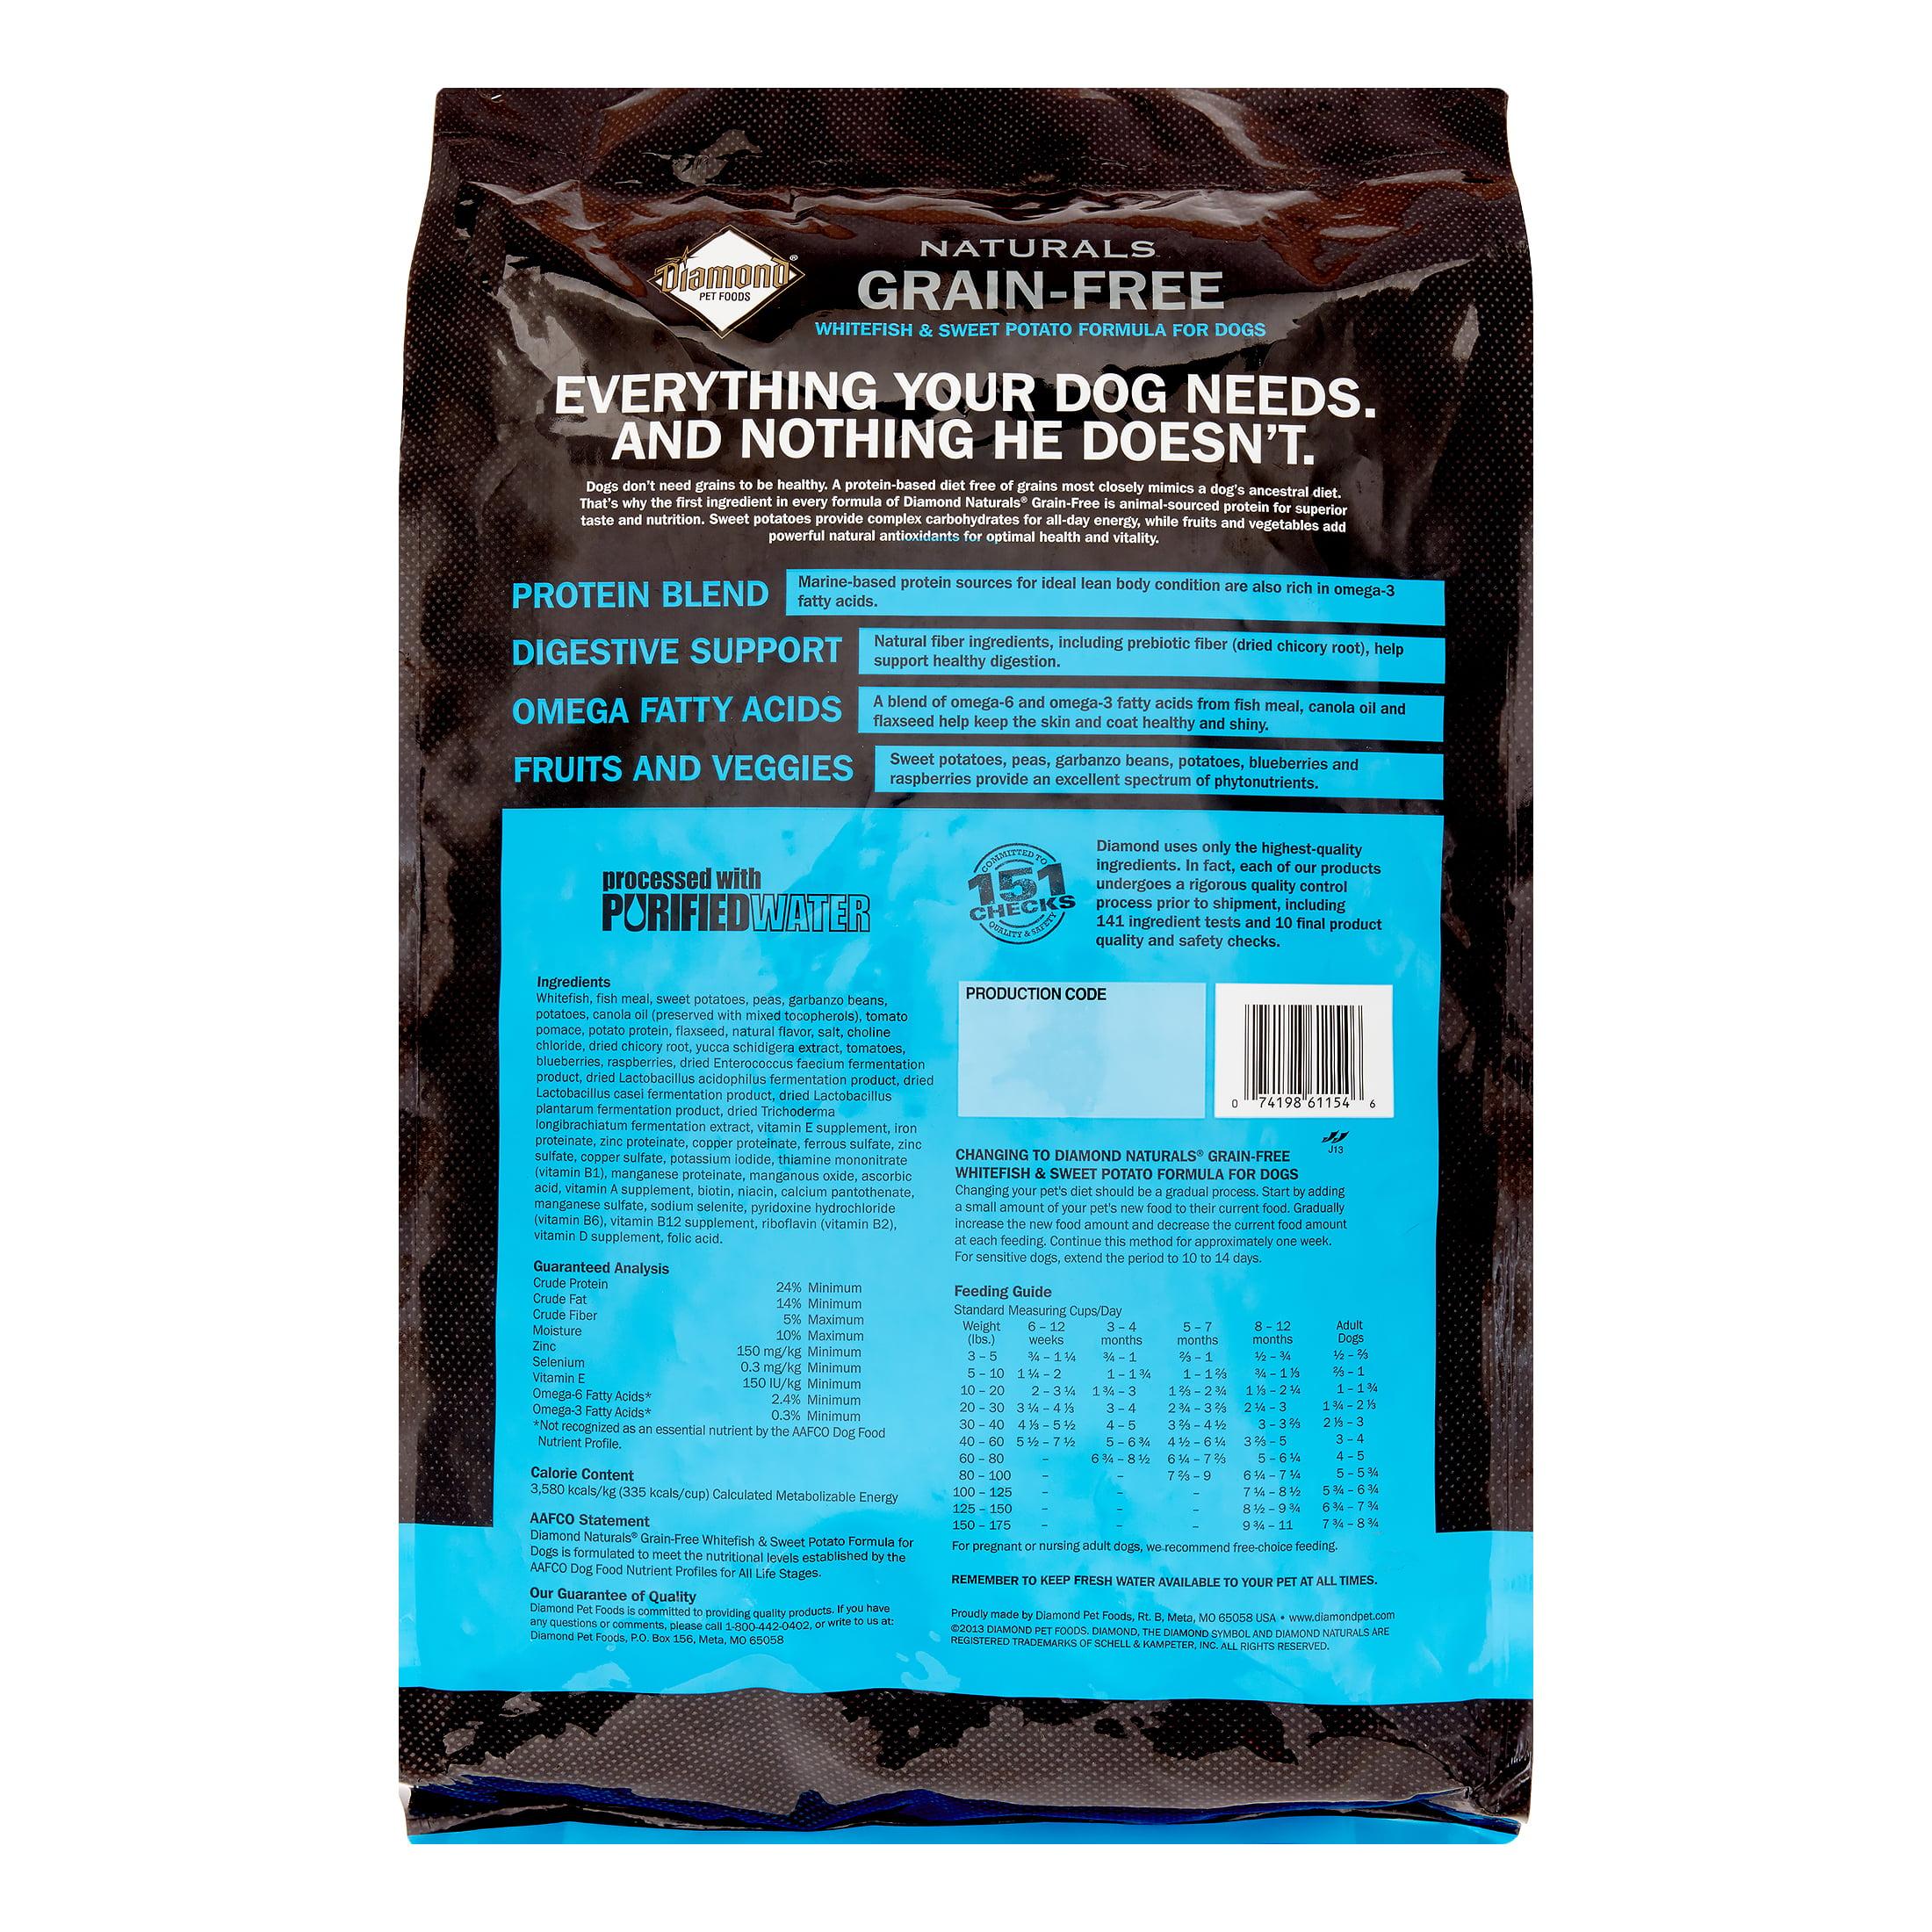 Diamond Grain-Free Whitefish & Sweet Potato Formula Dry Dog Food, 5 Lb